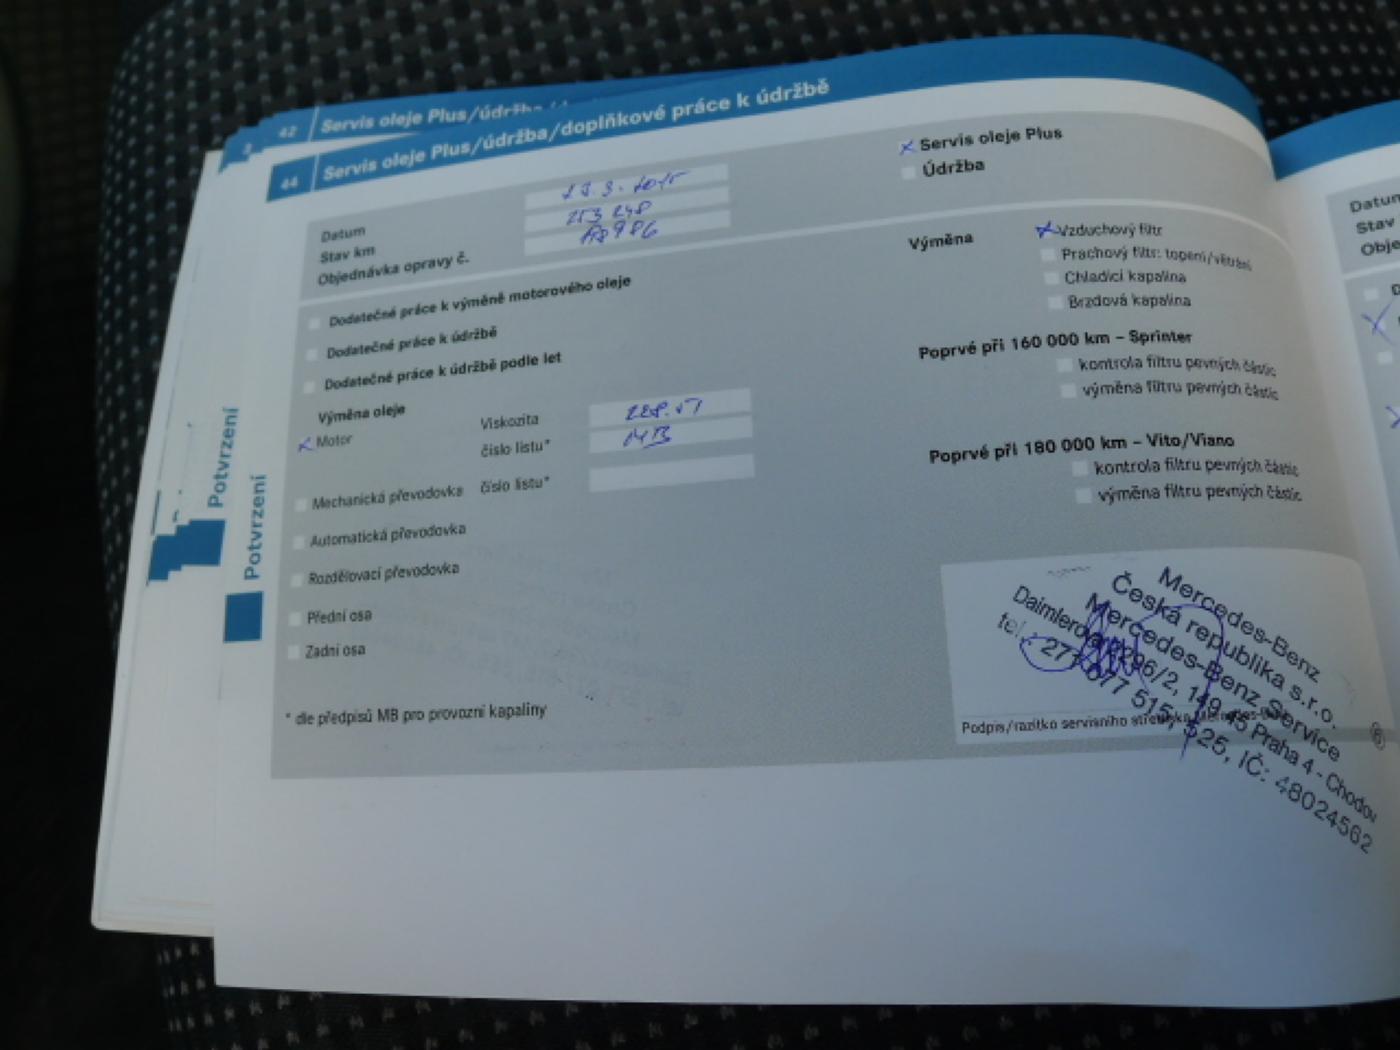 Mercedes-Benz Sprinter 319 CDI Maxi XXL + Klima Akce!!!! - 23